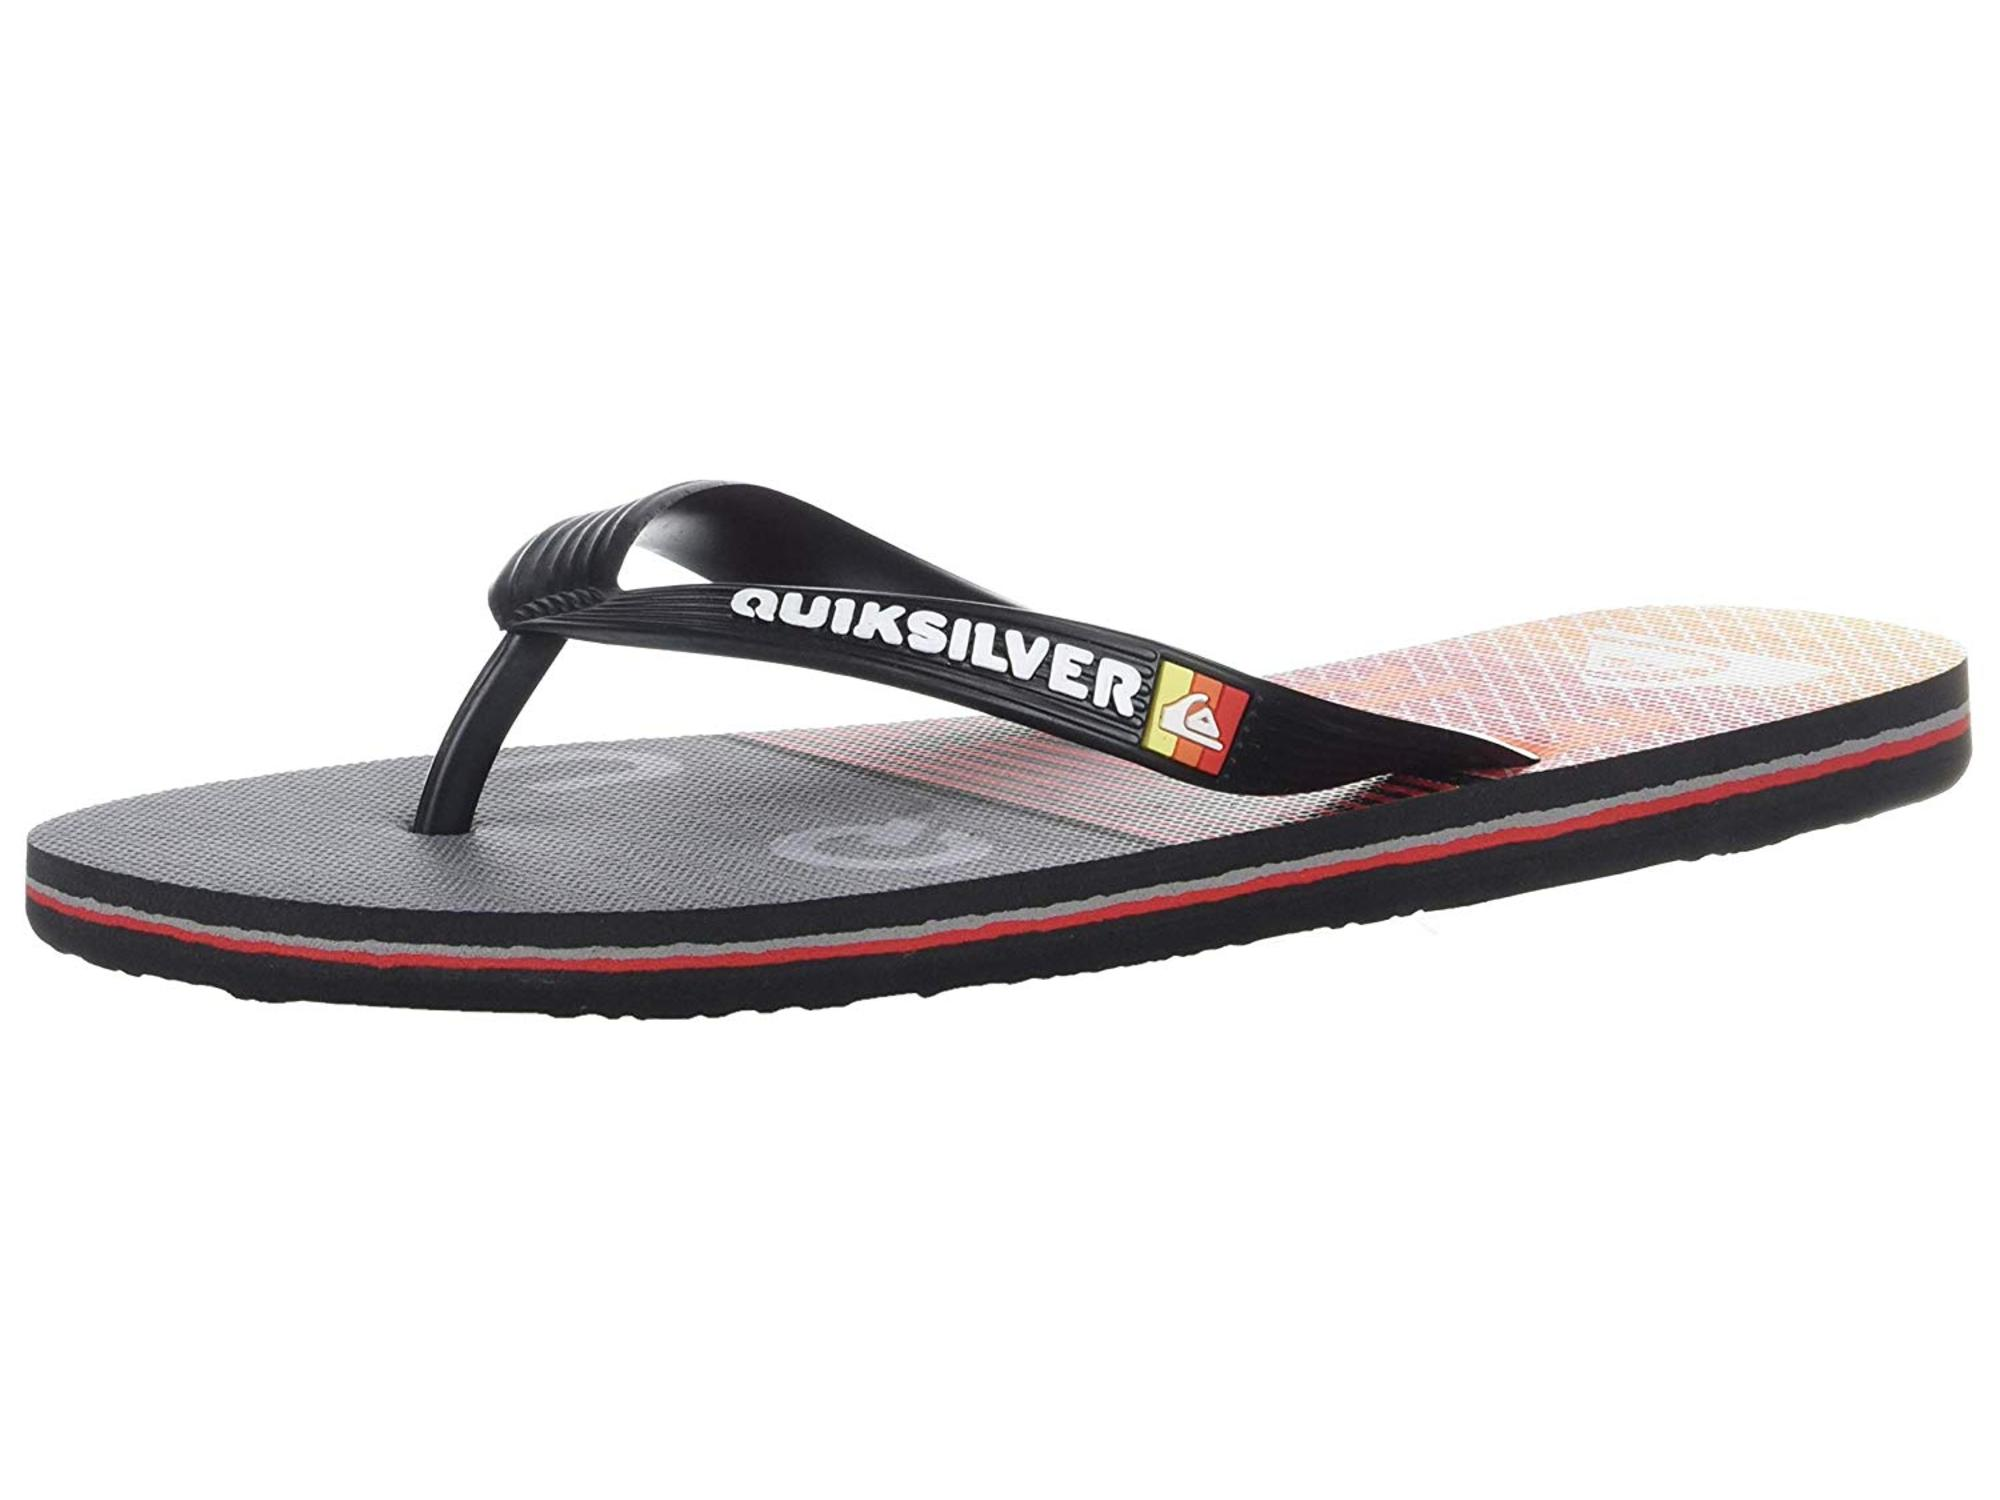 Quiksilver Men s Molokai Word Block Sandal e984517c877